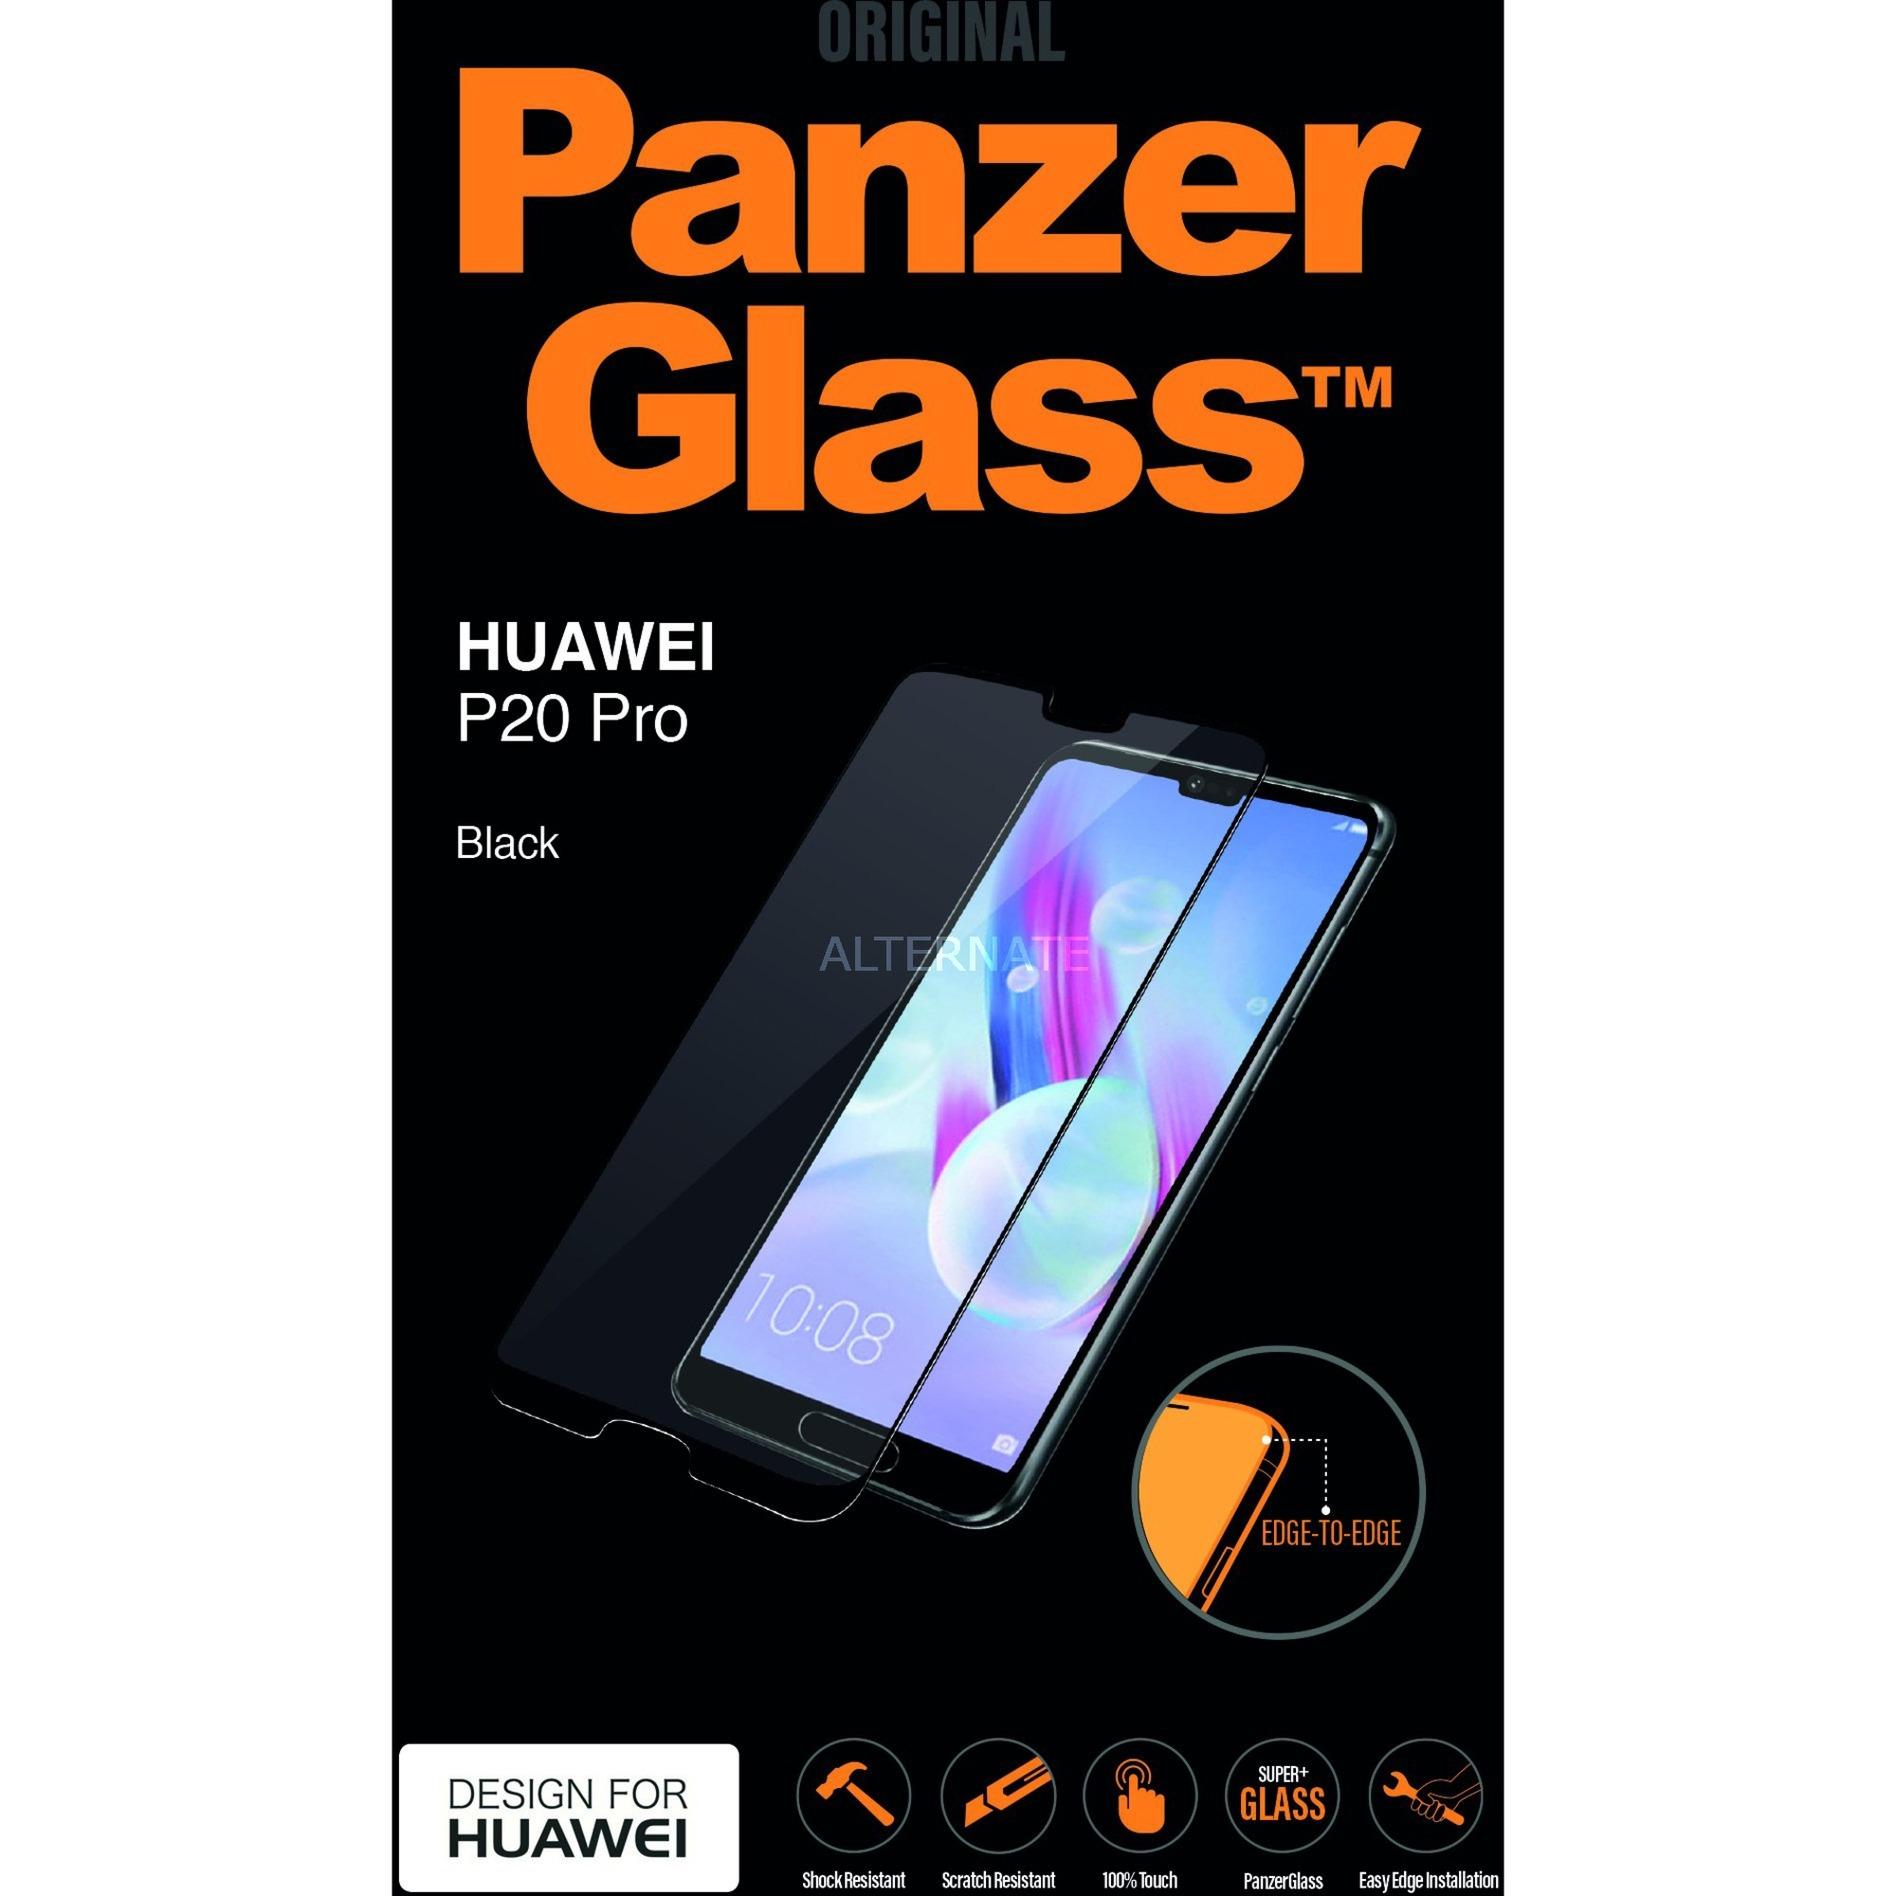 5299 protector de pantalla Huawei P20 Pro 1 pieza(s), Película protectora